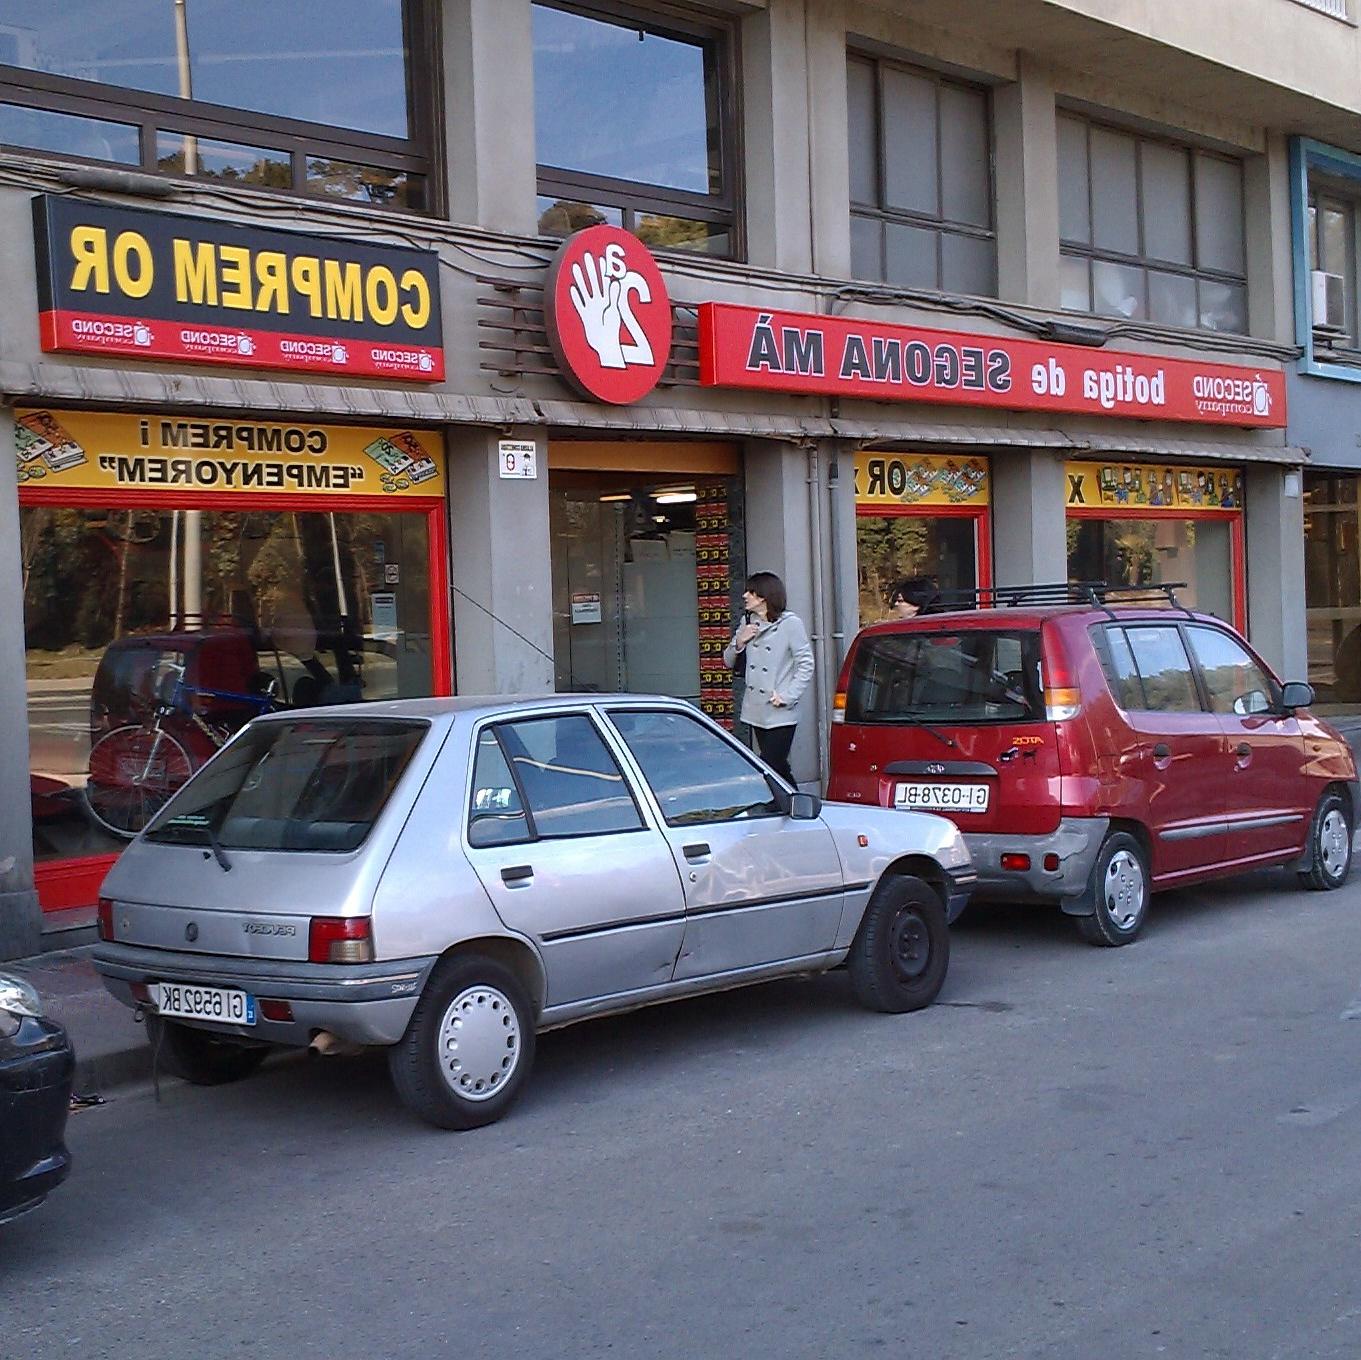 Segunda Mano Girona Muebles Mndw Tienda De Segunda Mano Second Pany